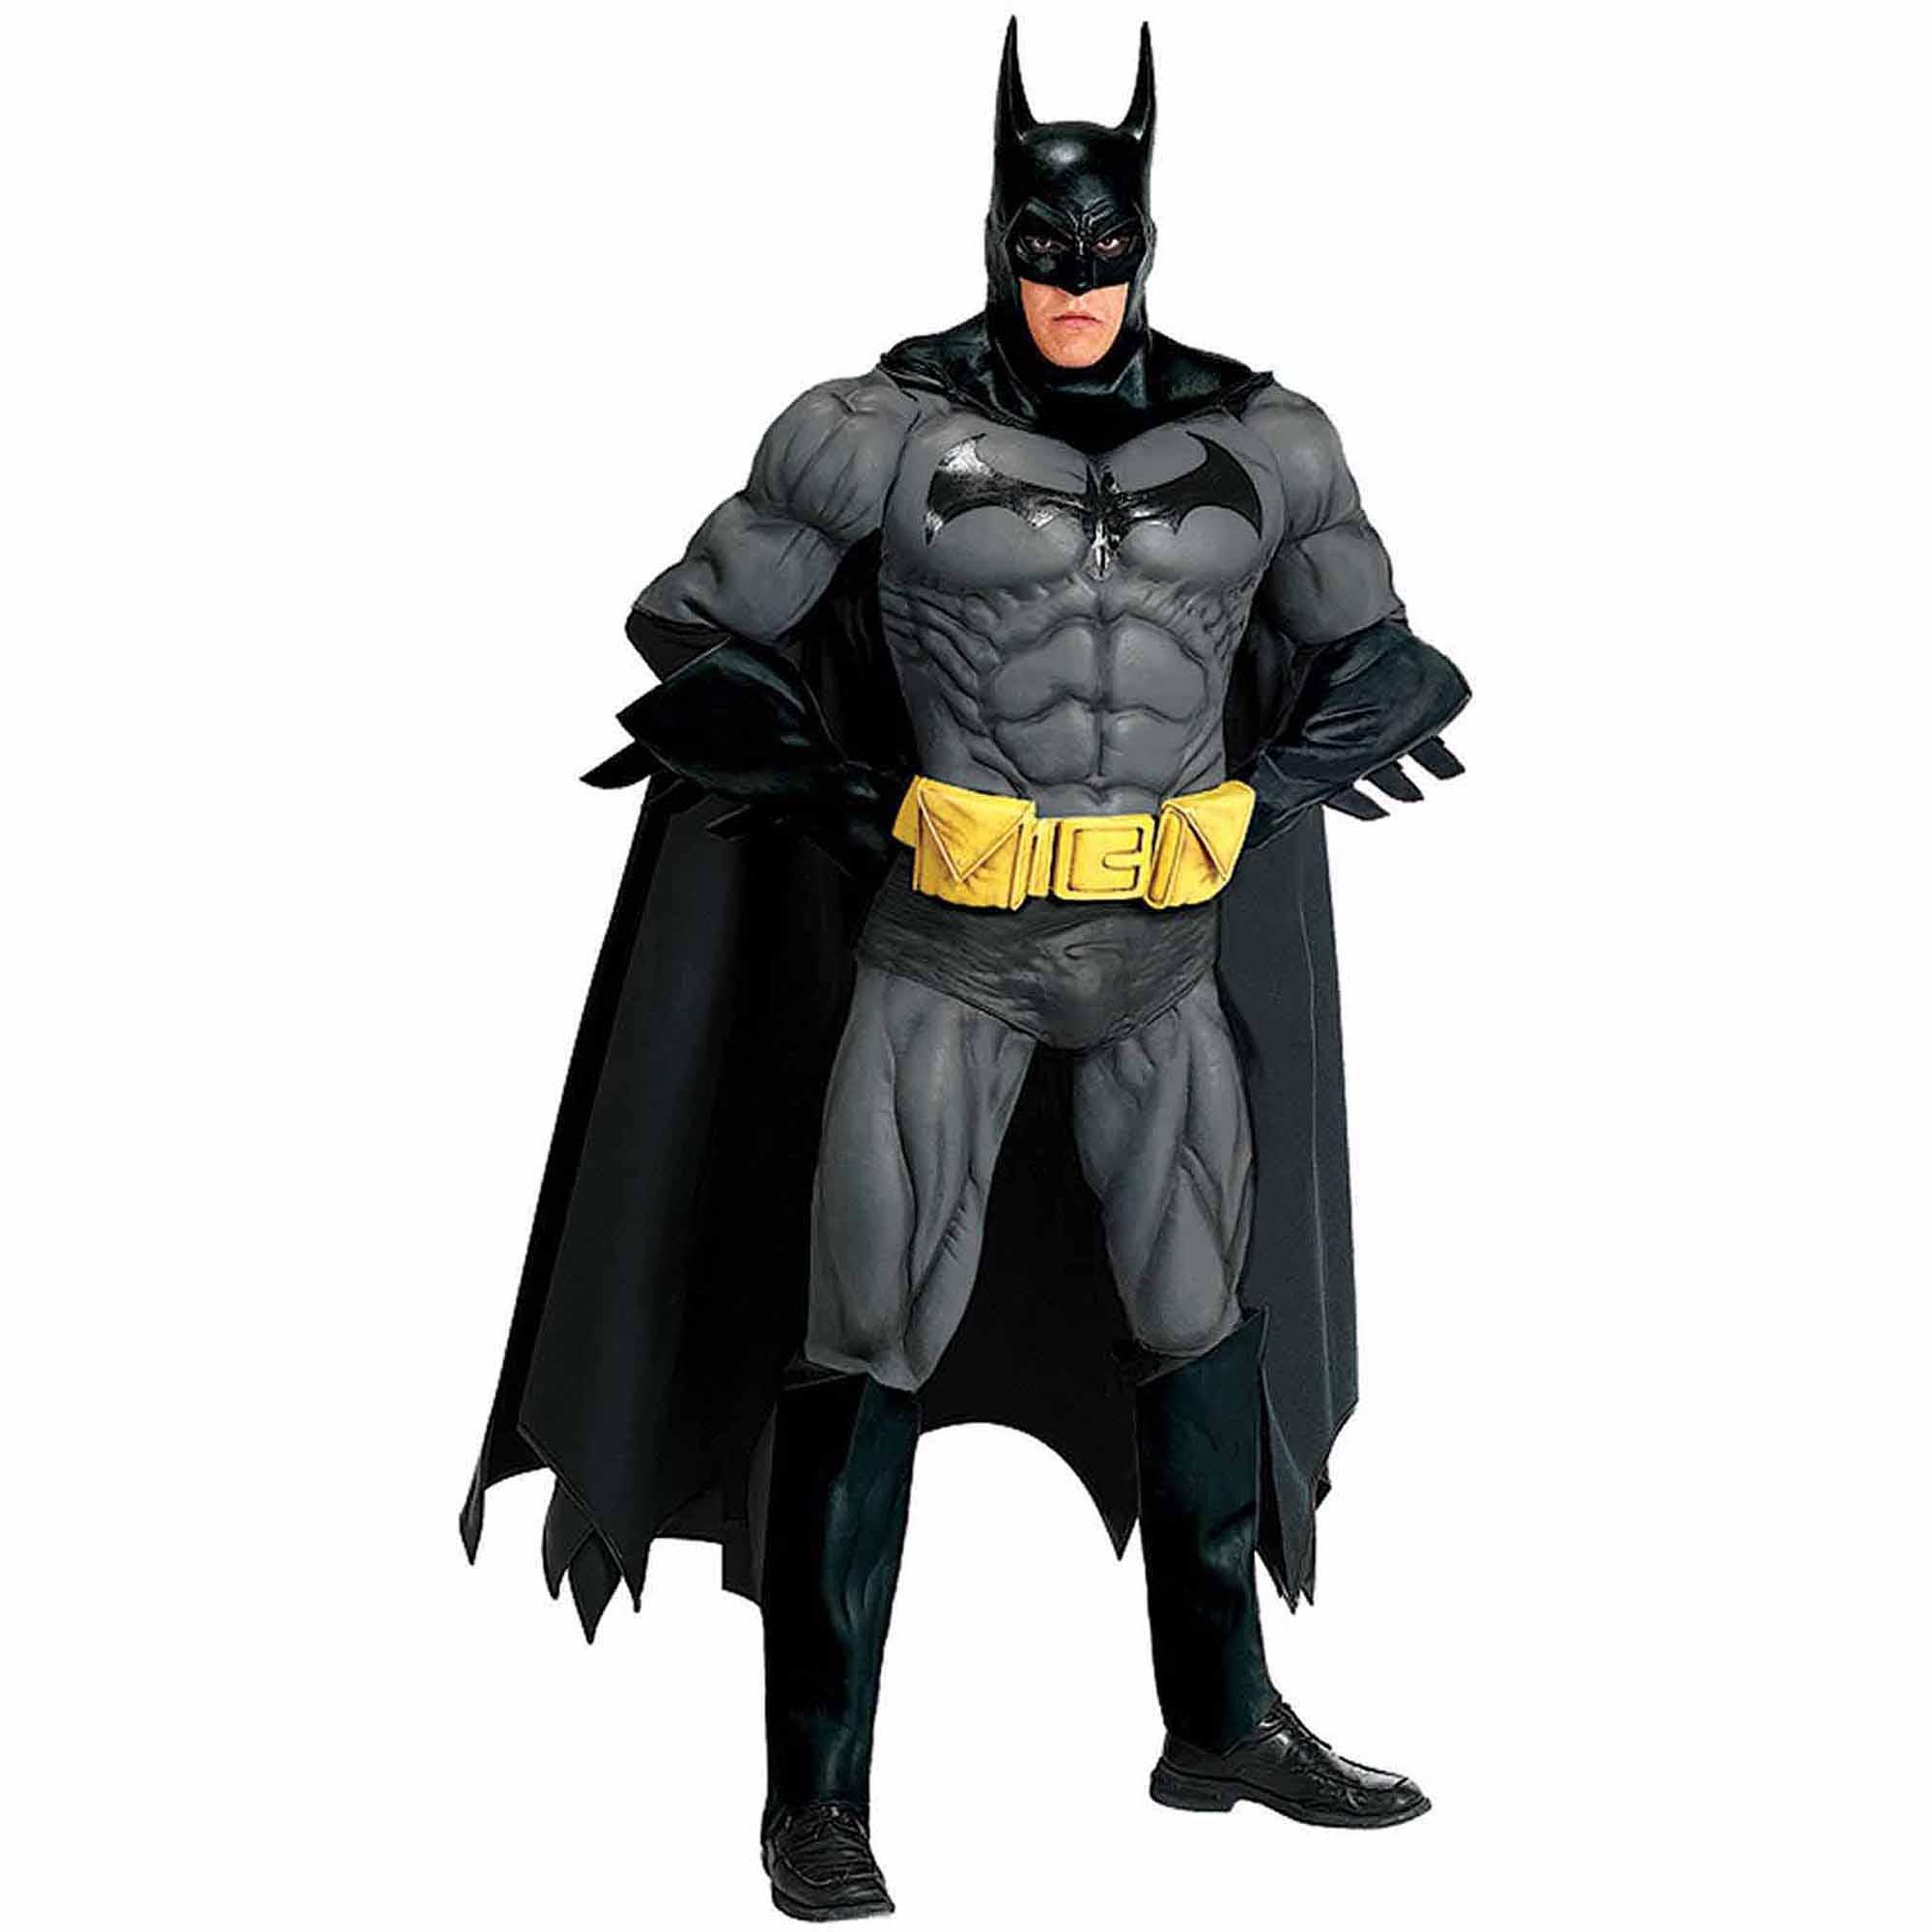 Collector's Edition Batman Adult Halloween Costume